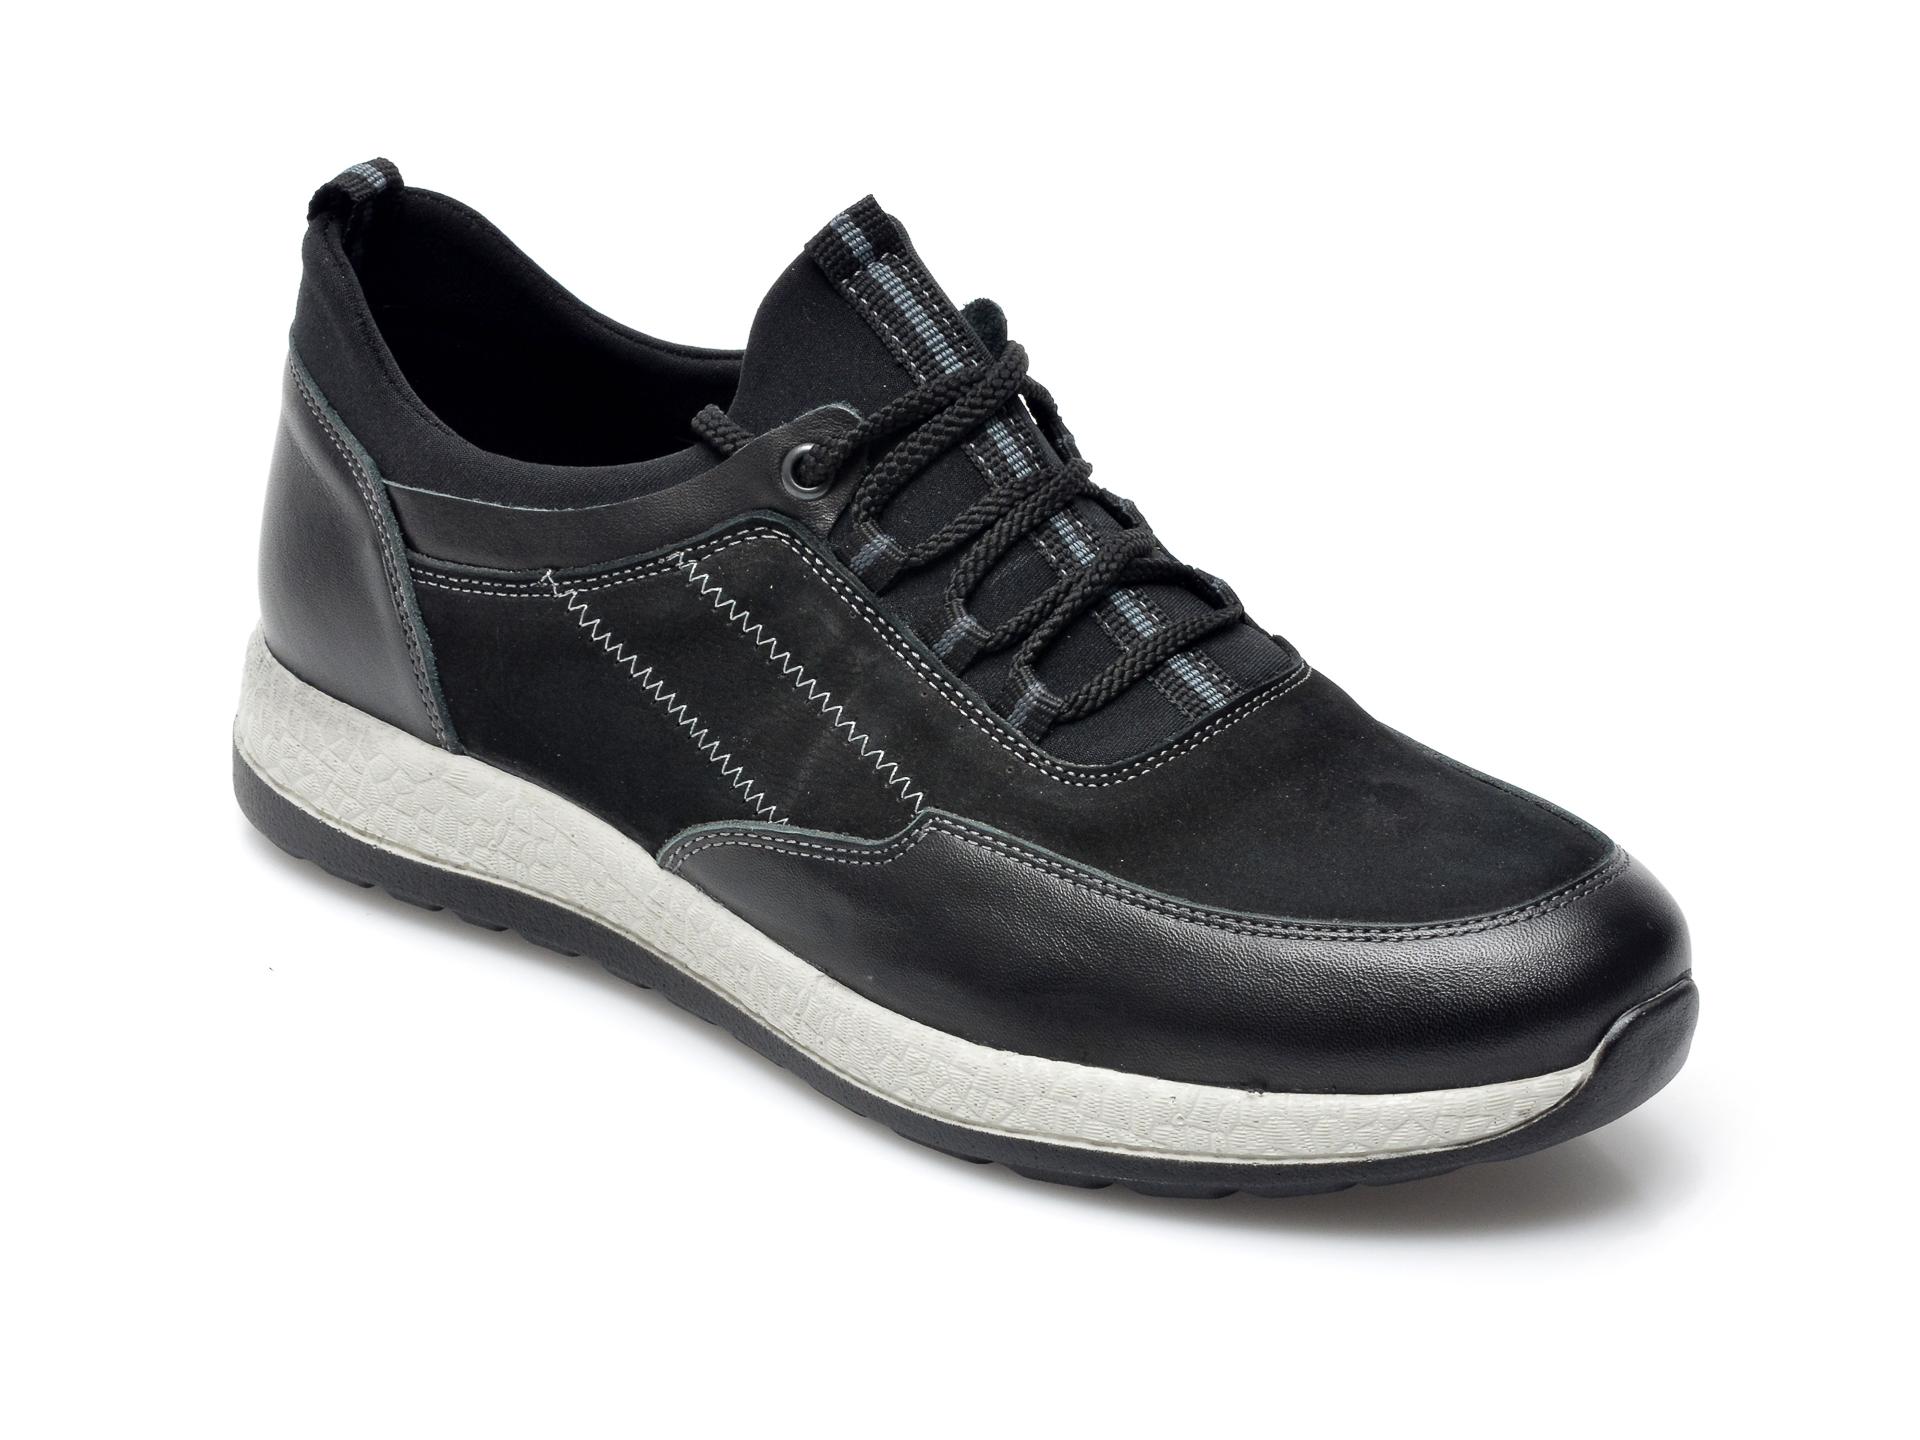 Pantofi Otter Negri, 22172, Din Nabuc